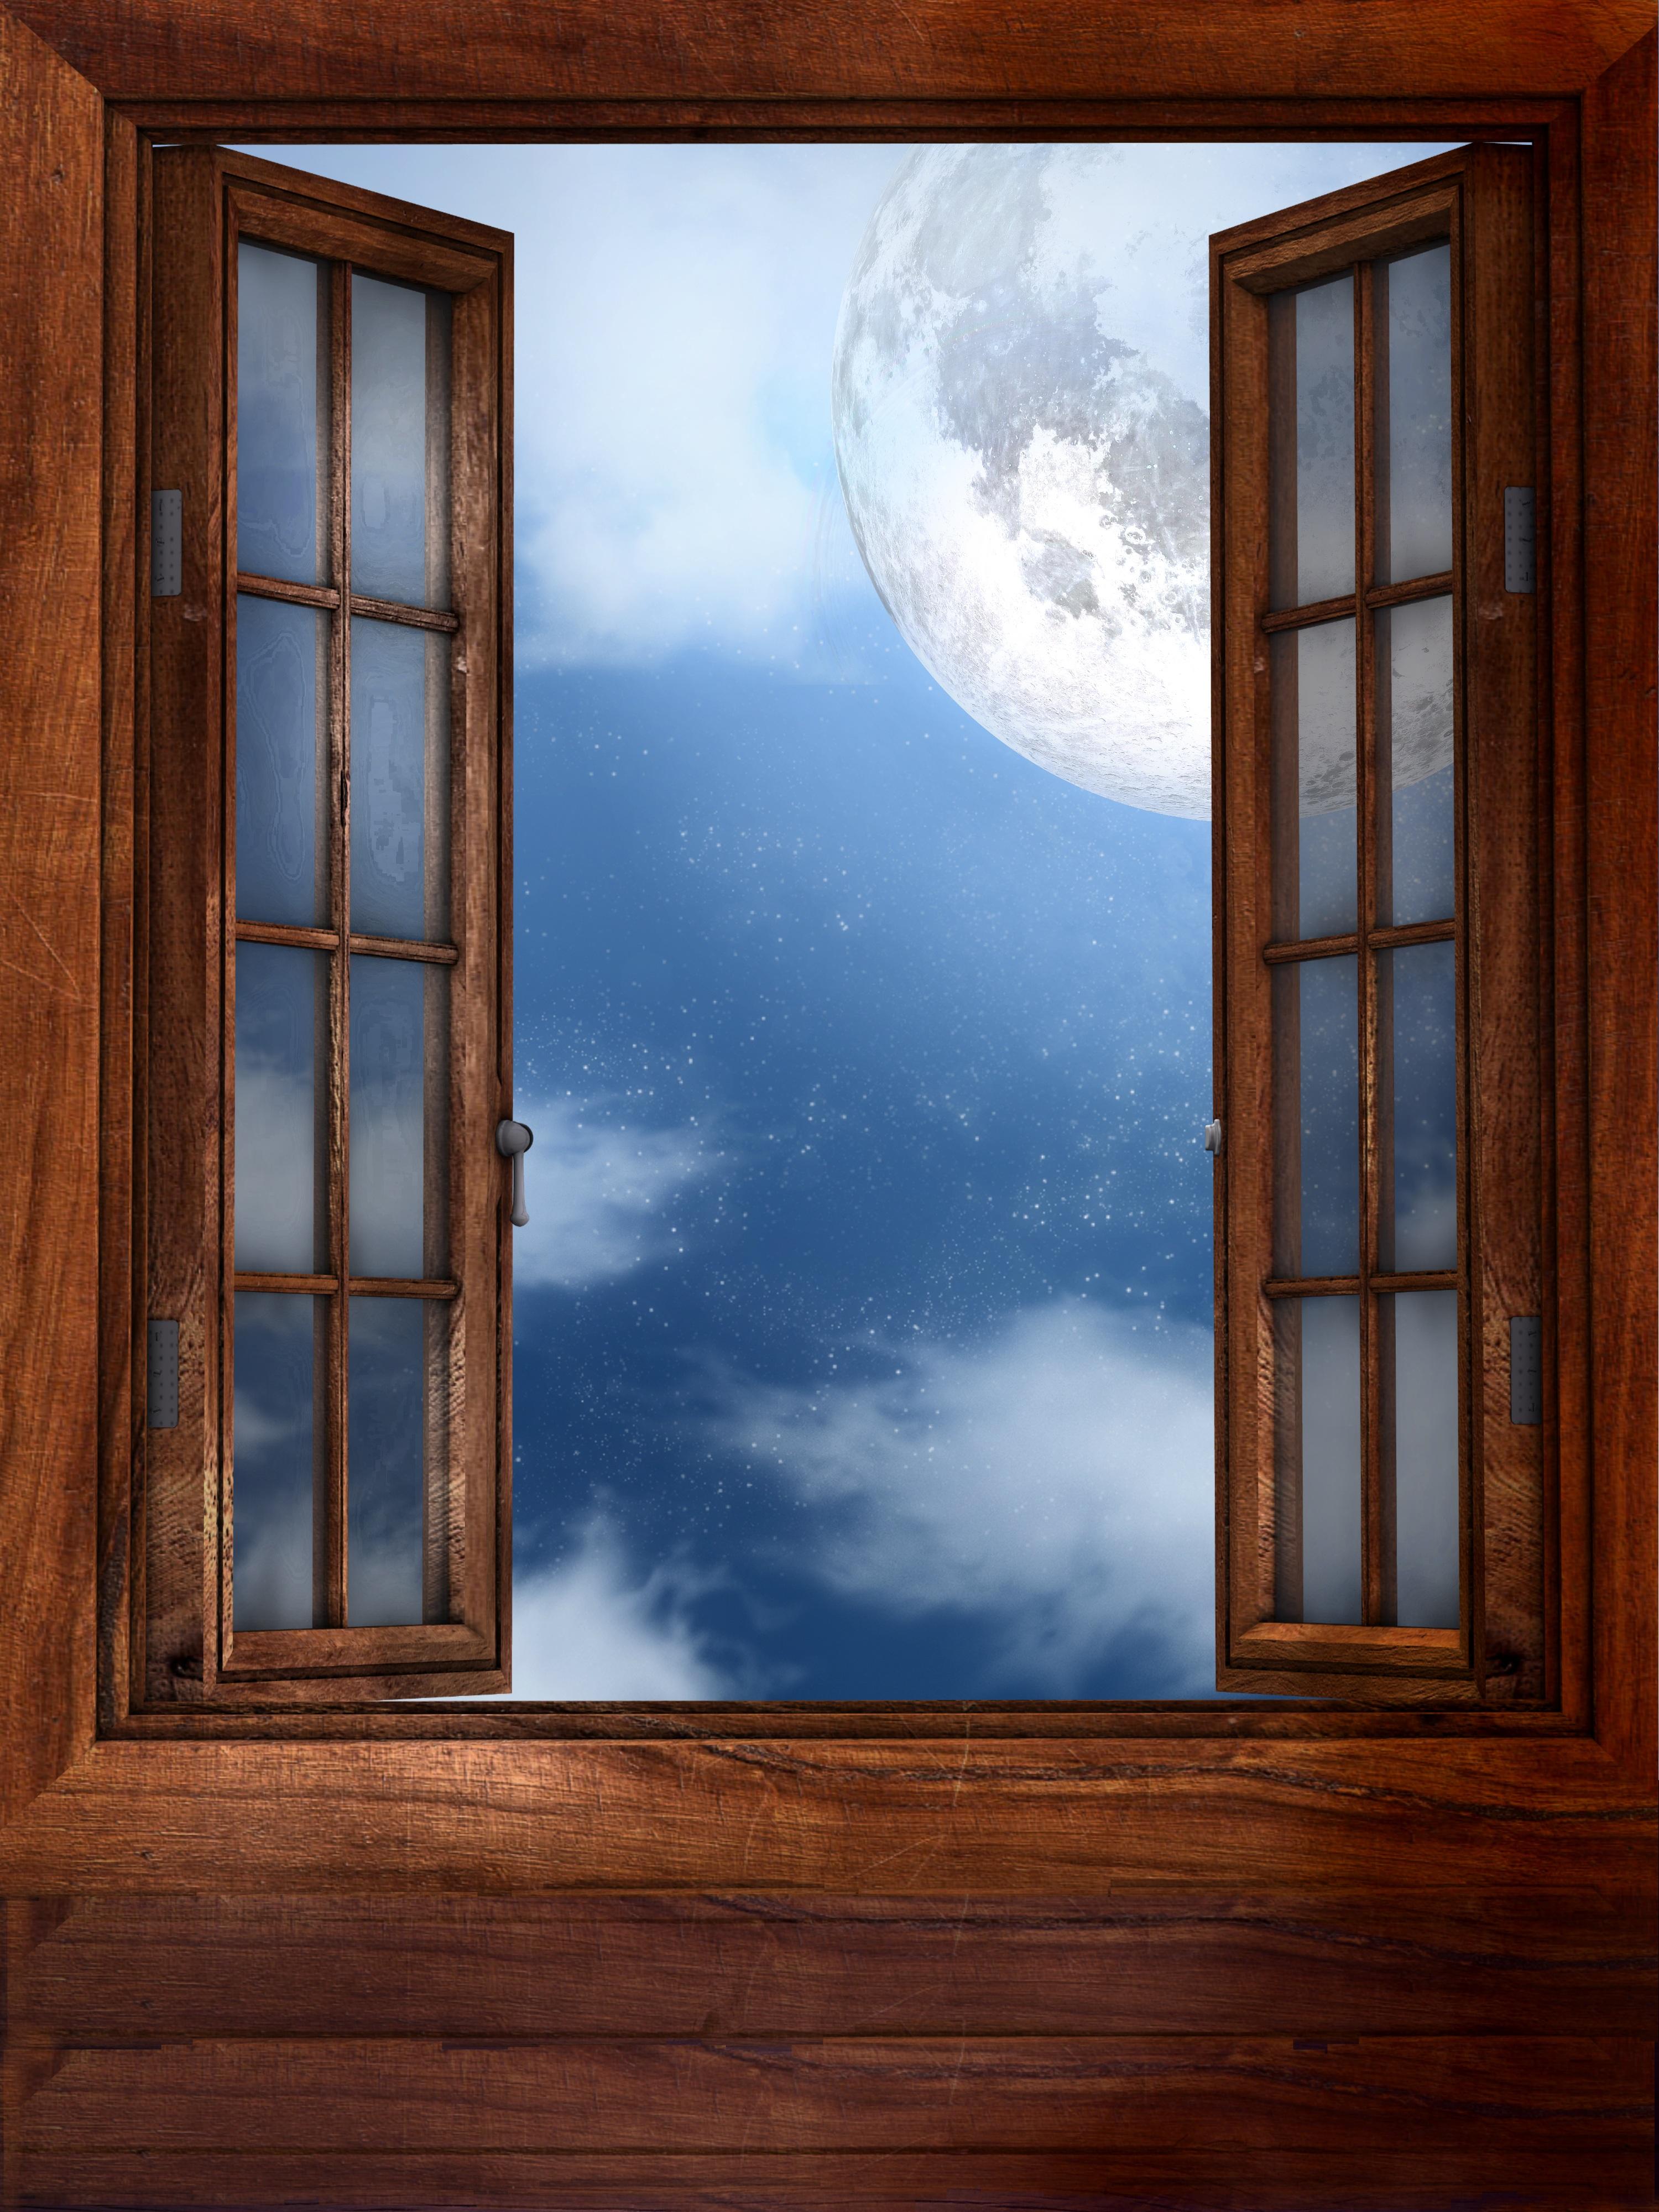 Open window at night - Window Moon Open Window Night